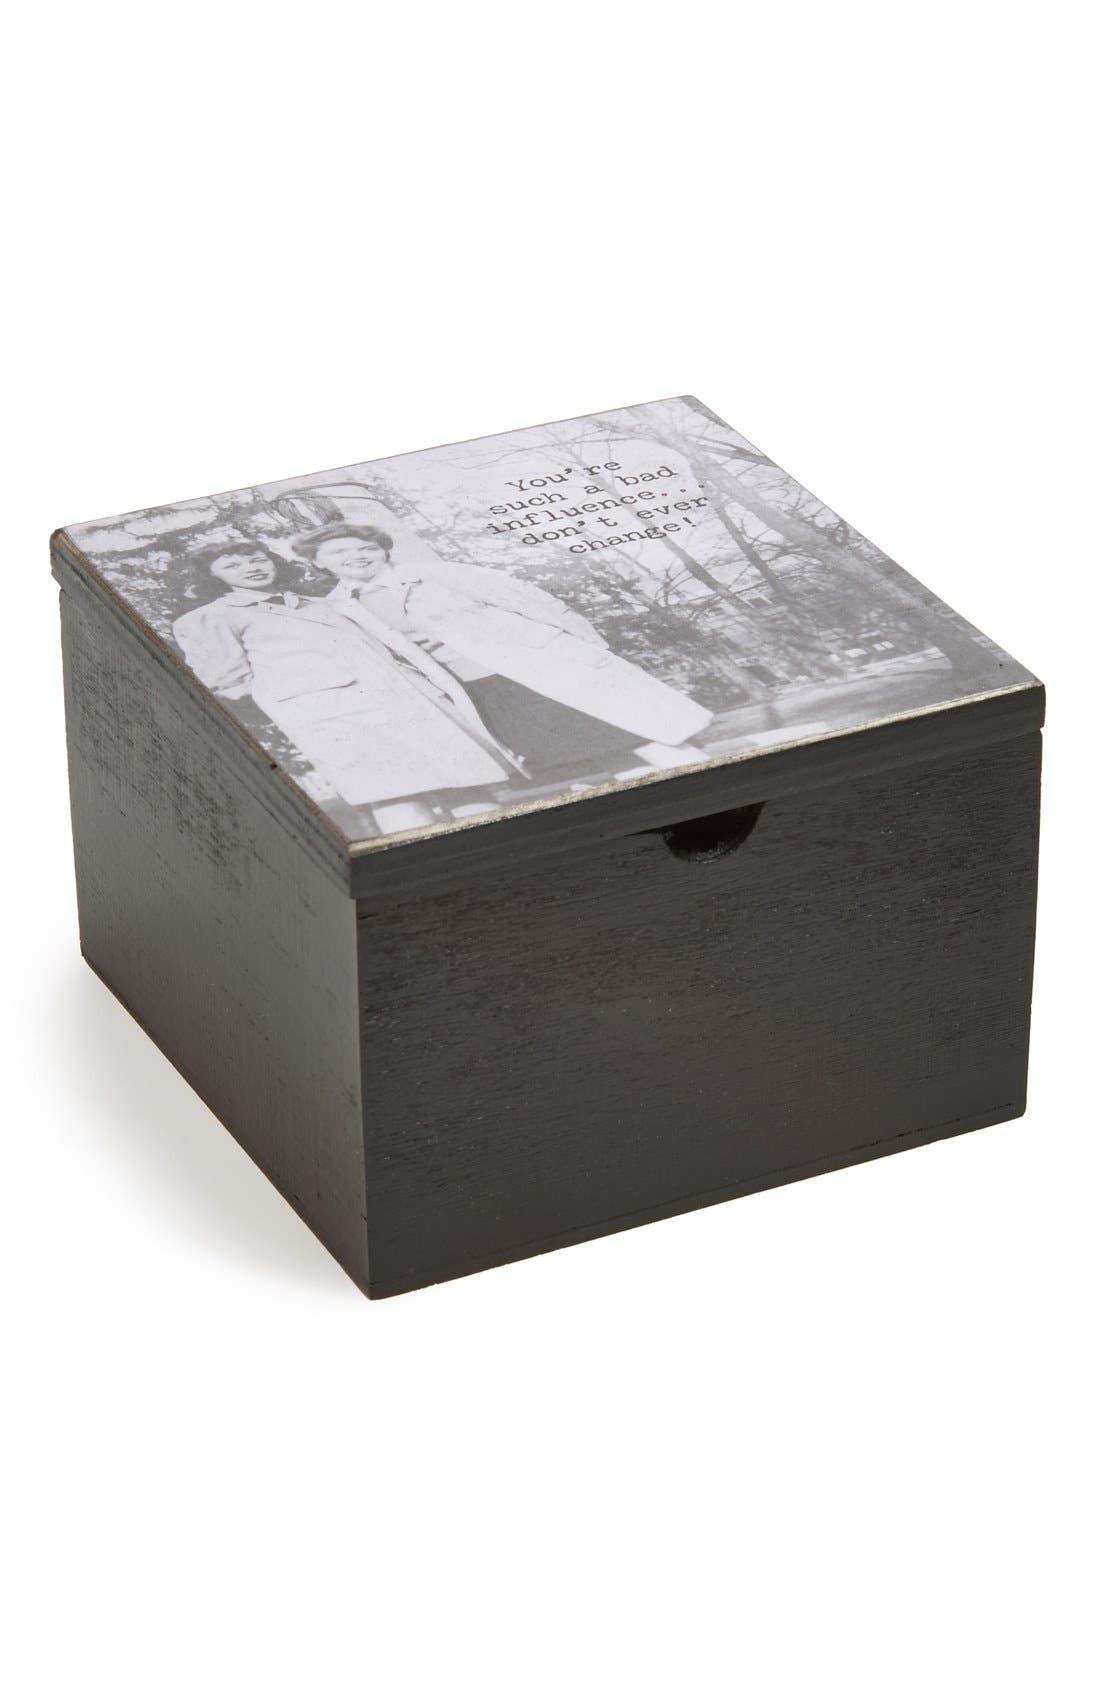 Alternate Image 2  - Trash Talk by Annie 'Don't Change' Wooden Decorative Box